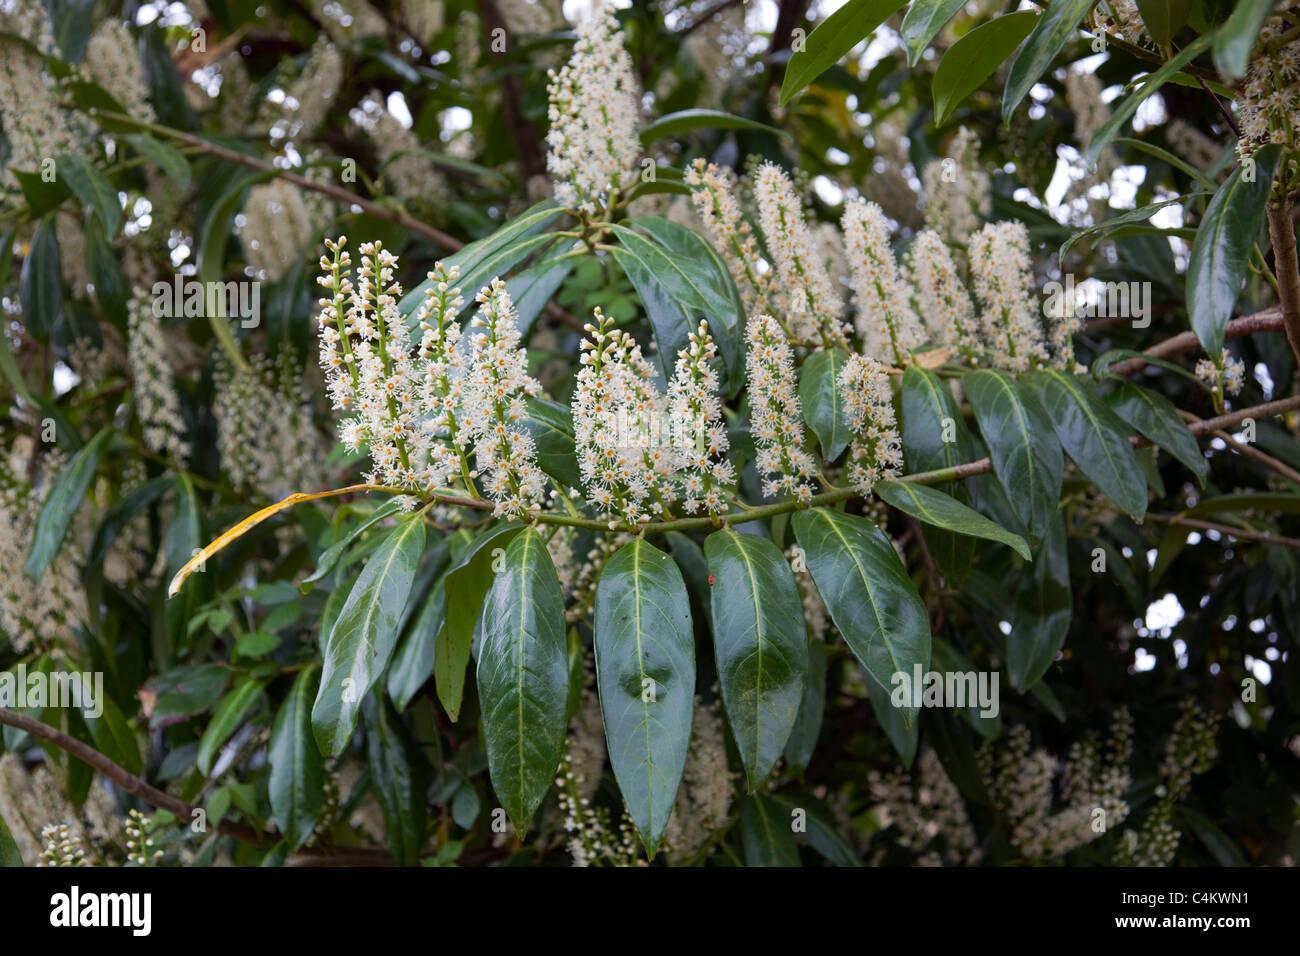 Laurel Flowers; - Stock Image